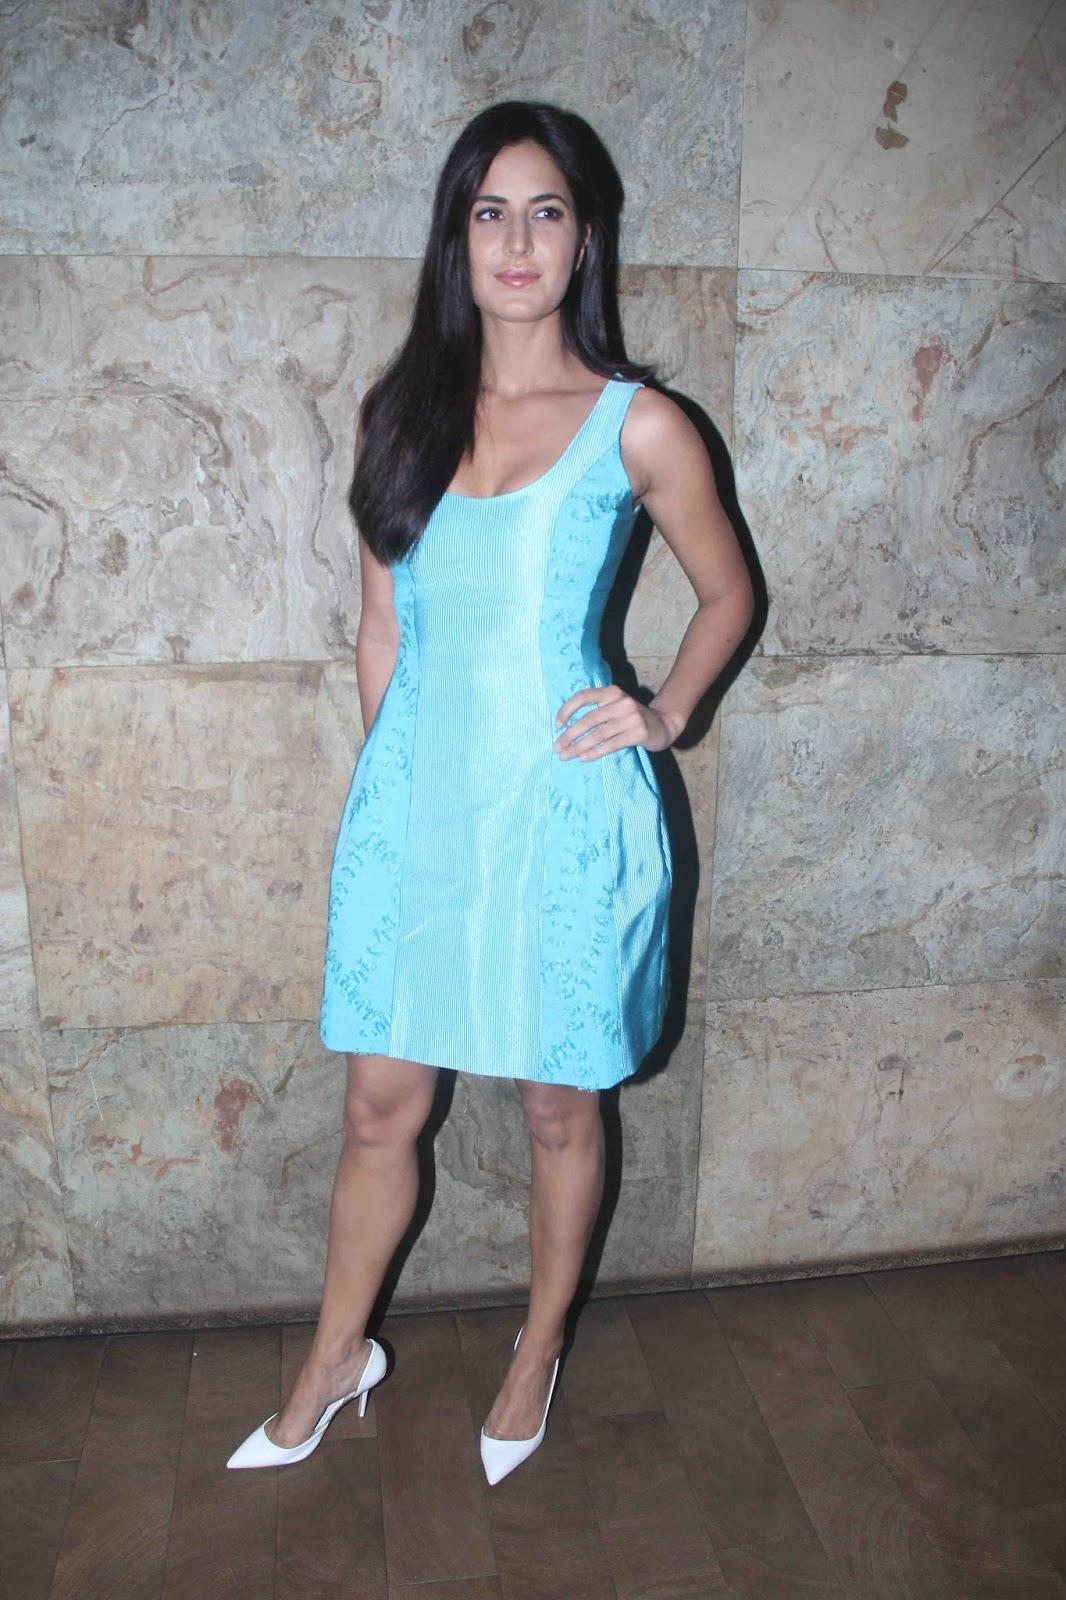 Katrina Kaif Looks Super Sexy In A Blue Short Dress At -3484